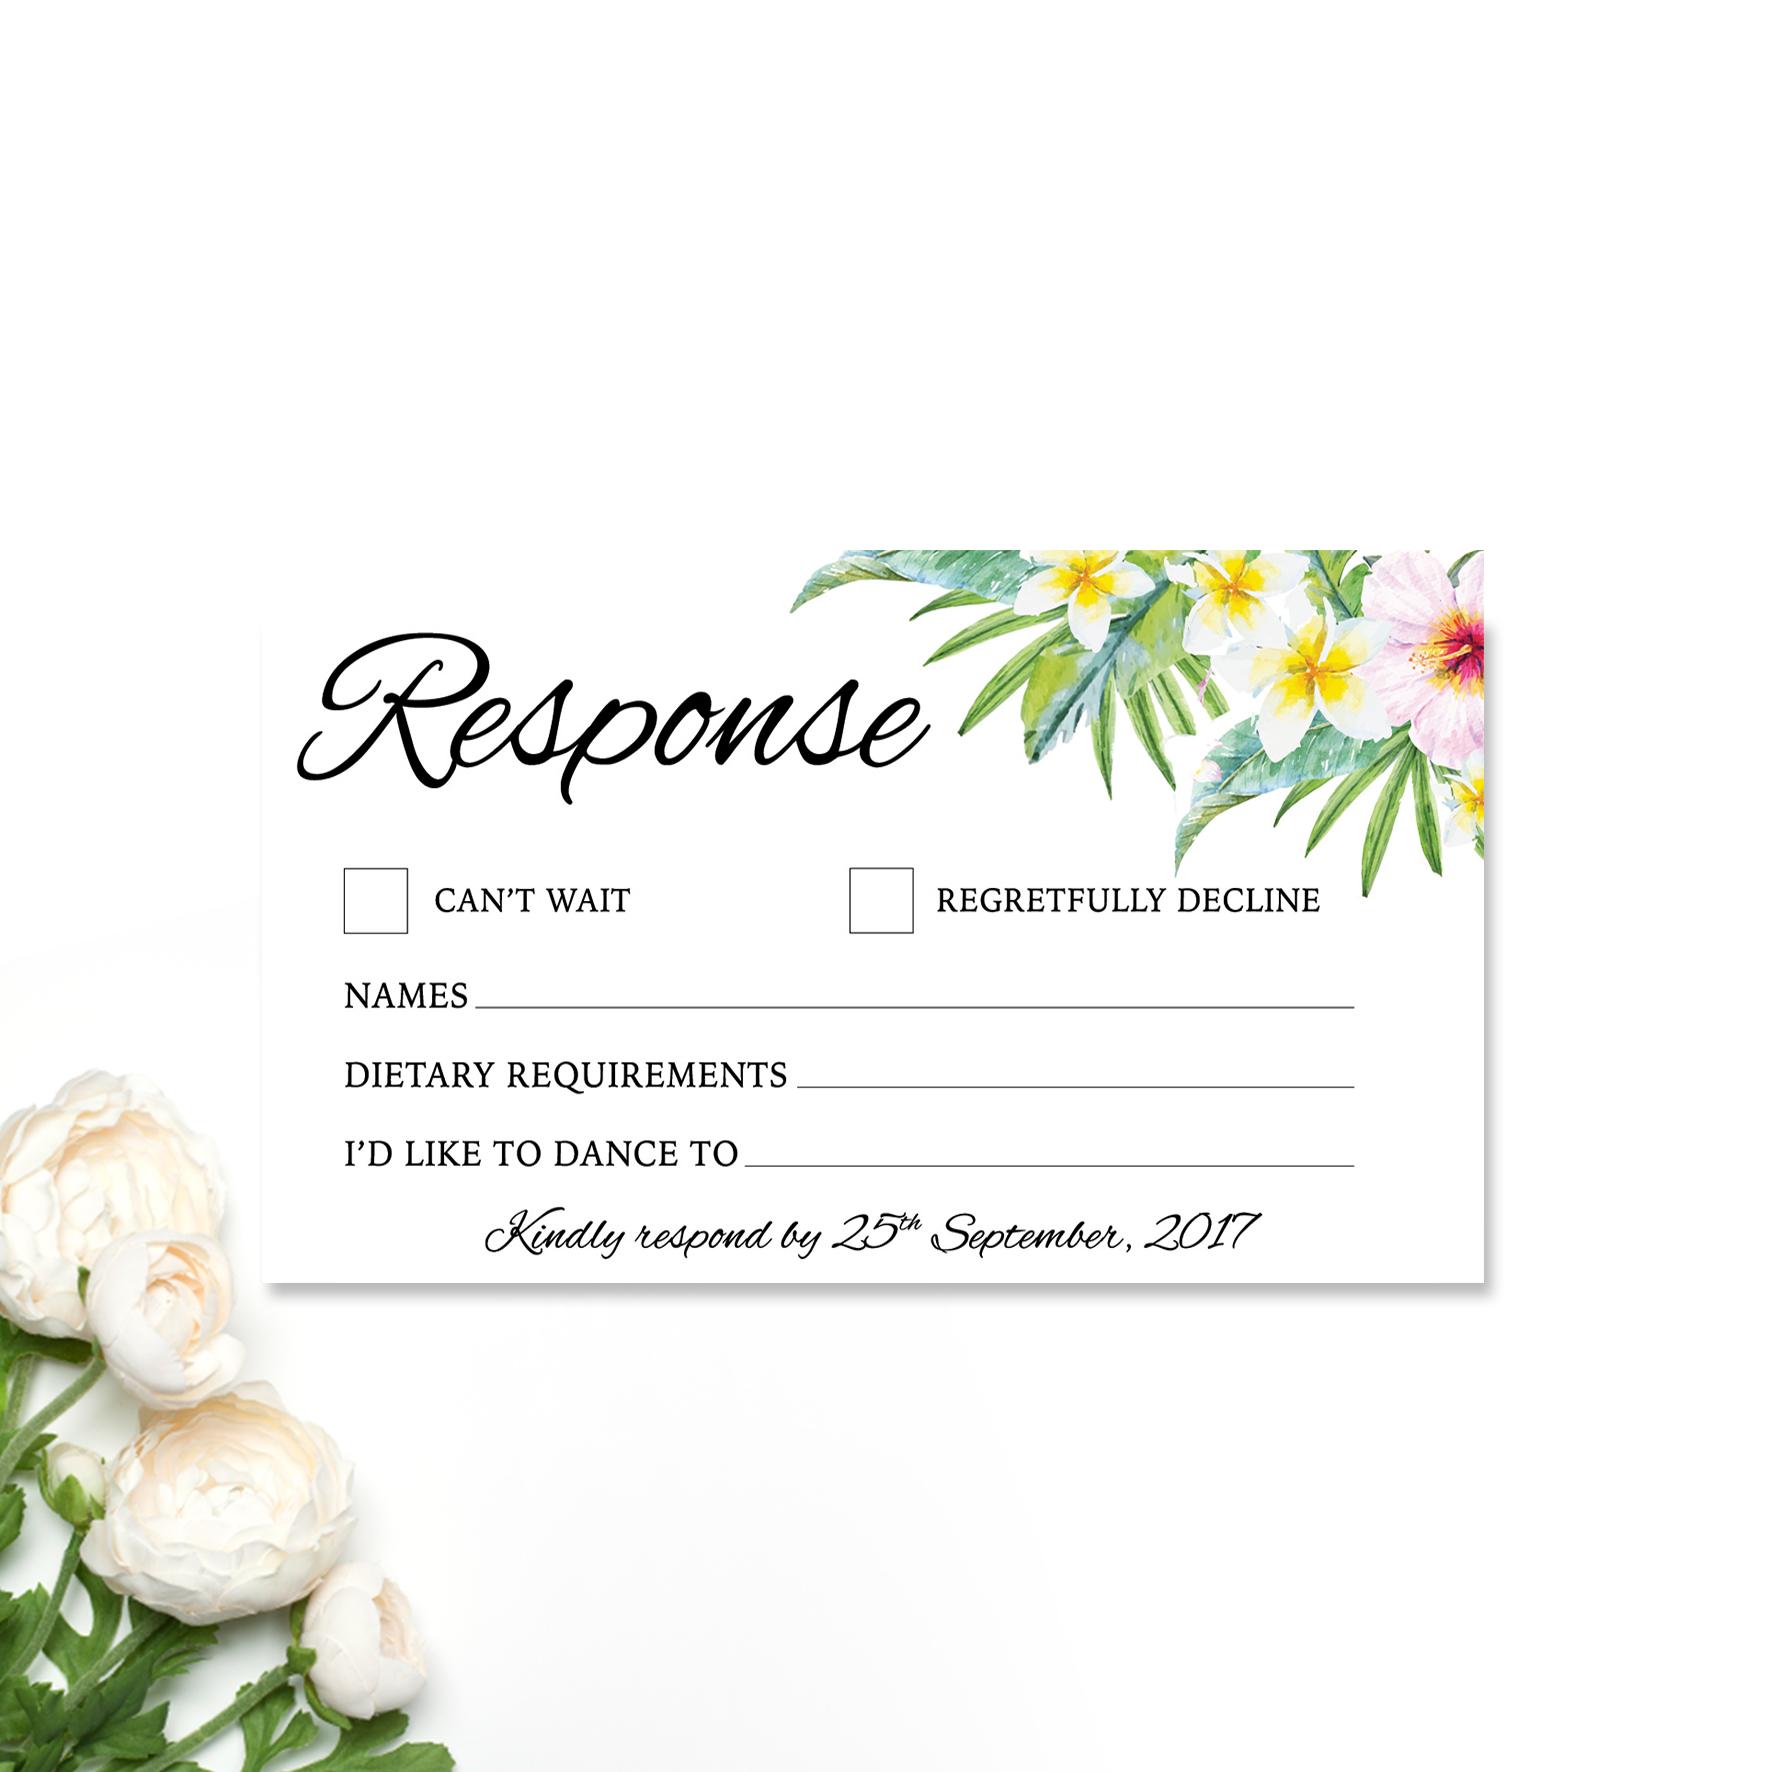 Sherilyn + Thomas Reply Card